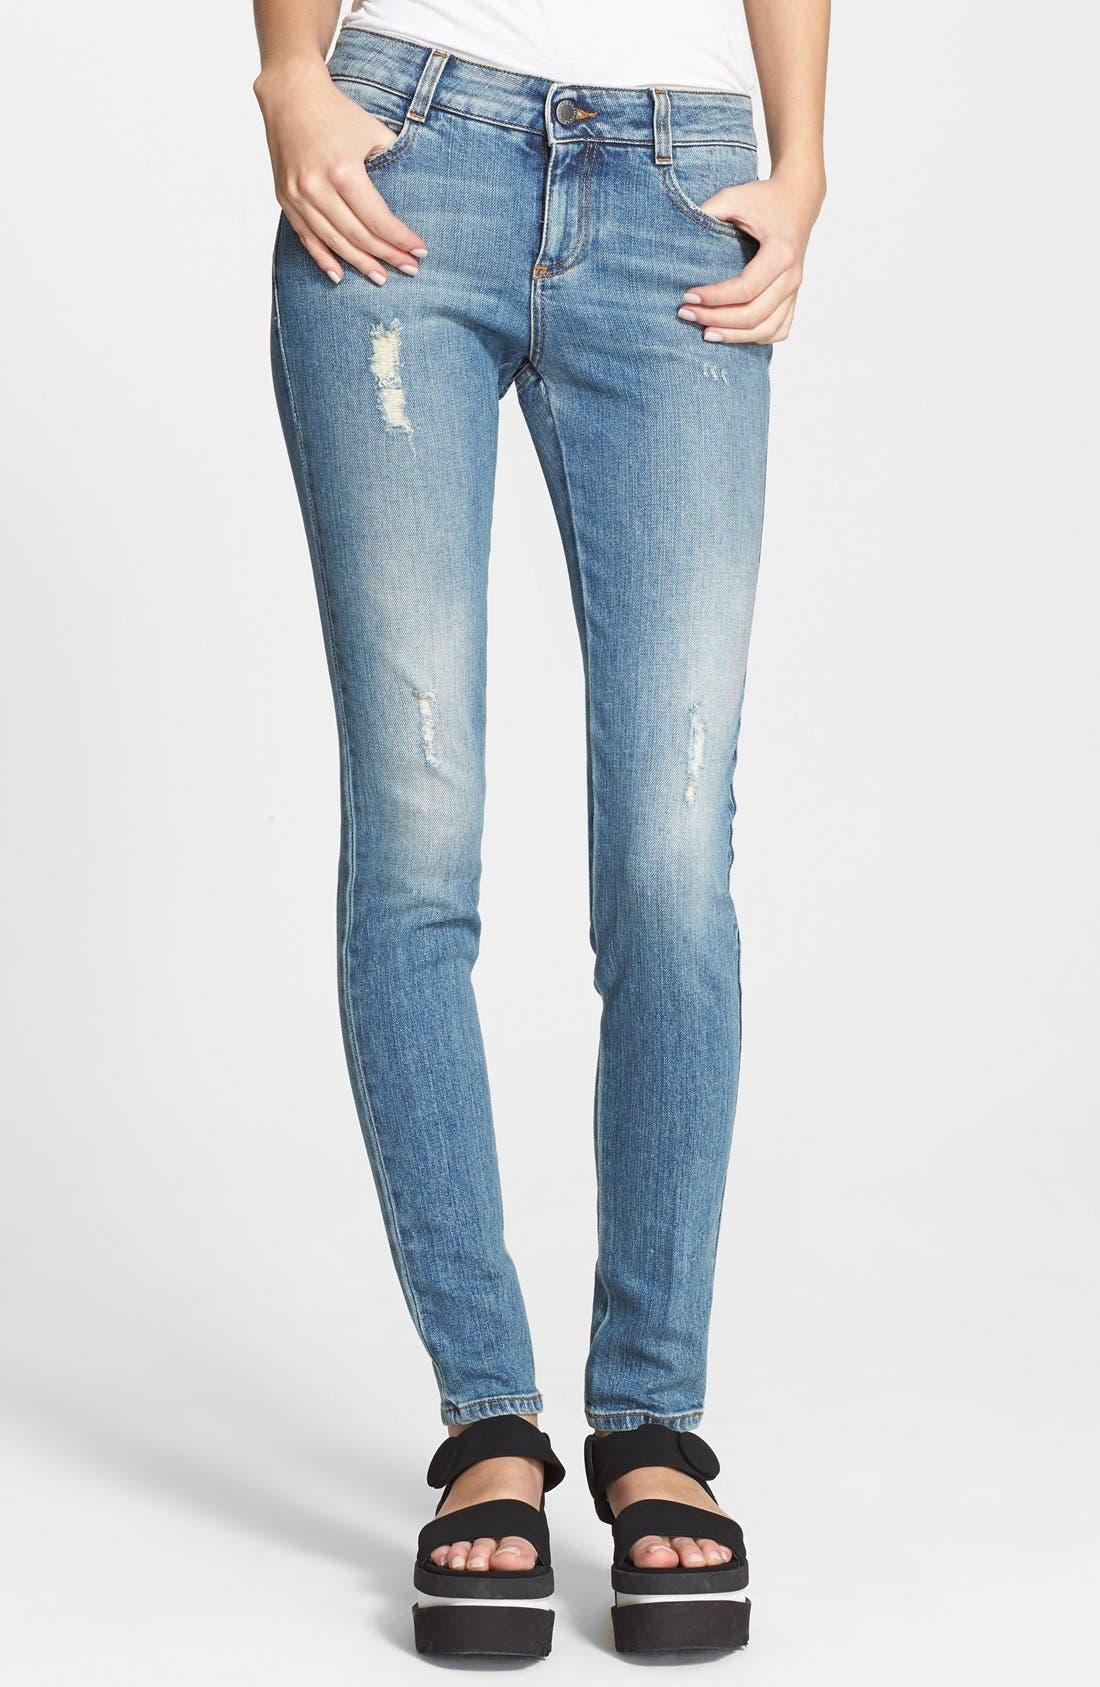 Alternate Image 1 Selected - Stella McCartney 'The Skinny Long' Jeans